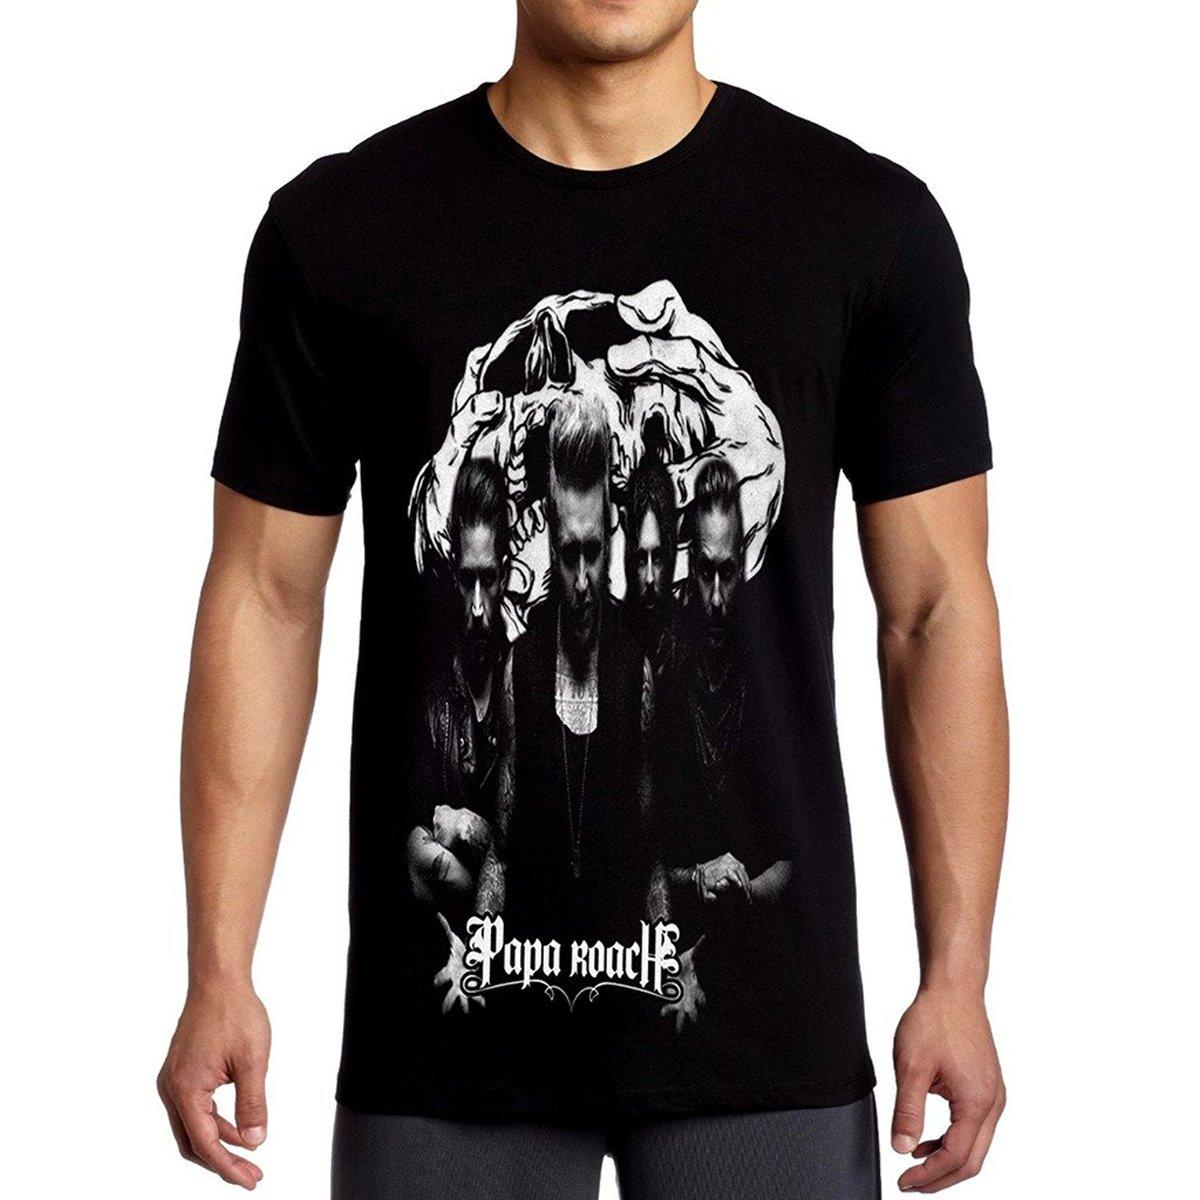 Mazumi8 Papa Roach Skull Metal T Shirt Short Sleeve Cotton T Shirts Man Clothing O Neck Tee Shirt Comfortable Top Tee in T Shirts from Men 39 s Clothing